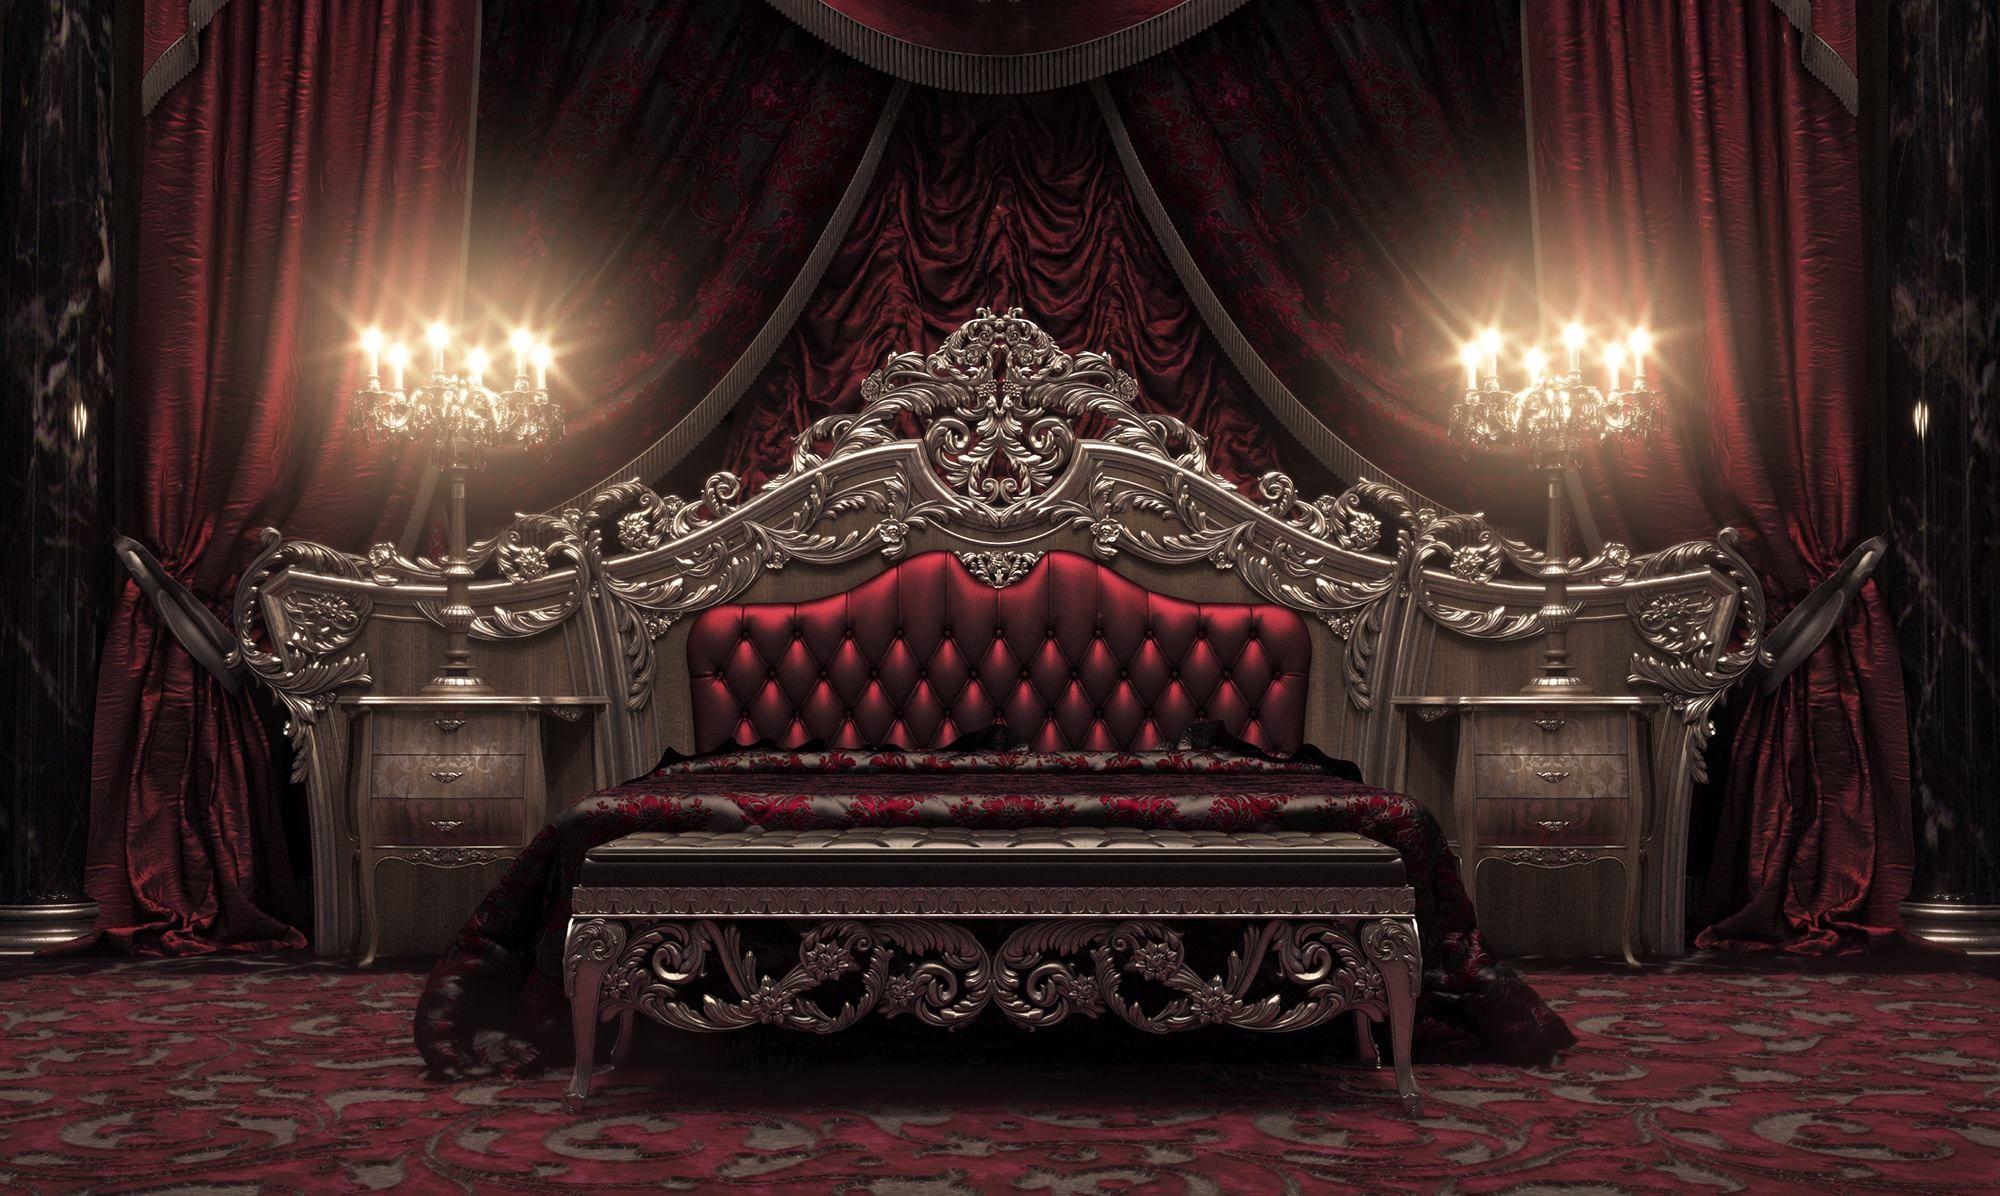 schmiedeeisen italienische ornament bett m bel bilder. Black Bedroom Furniture Sets. Home Design Ideas